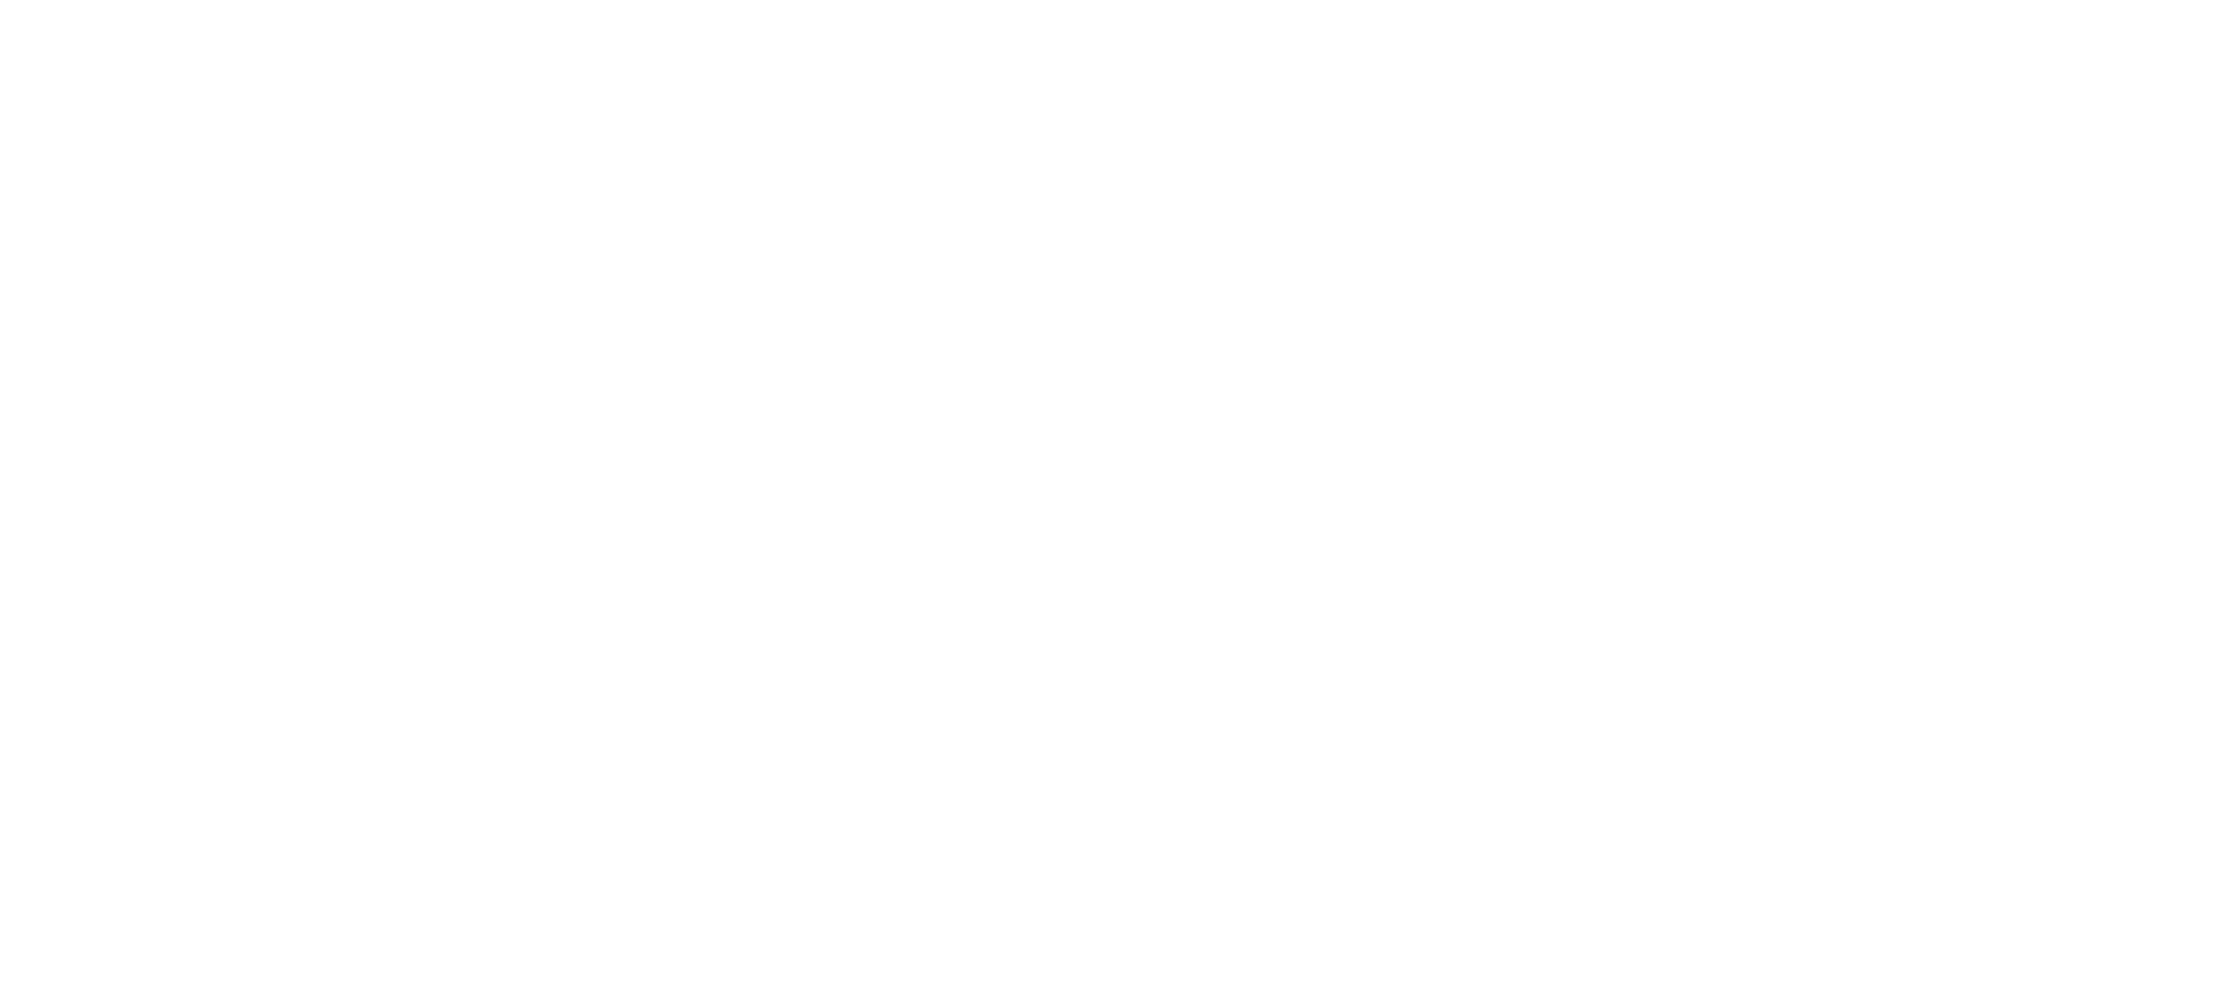 hardcard_viff2014_laurel.png